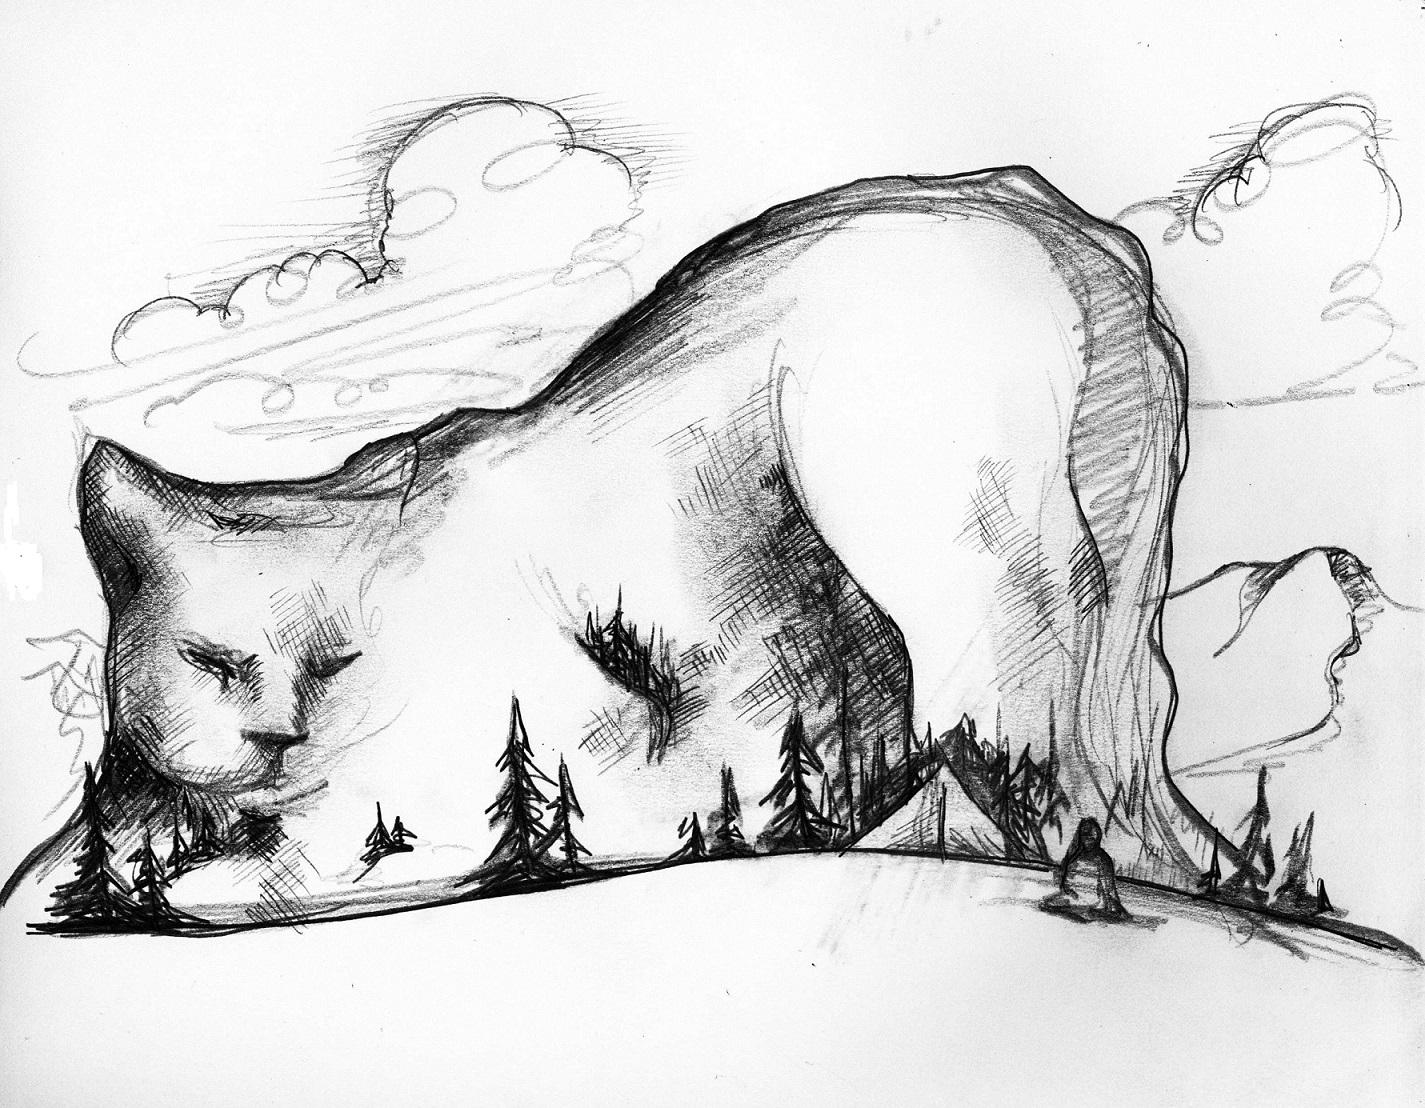 Art by Tyra Olstad